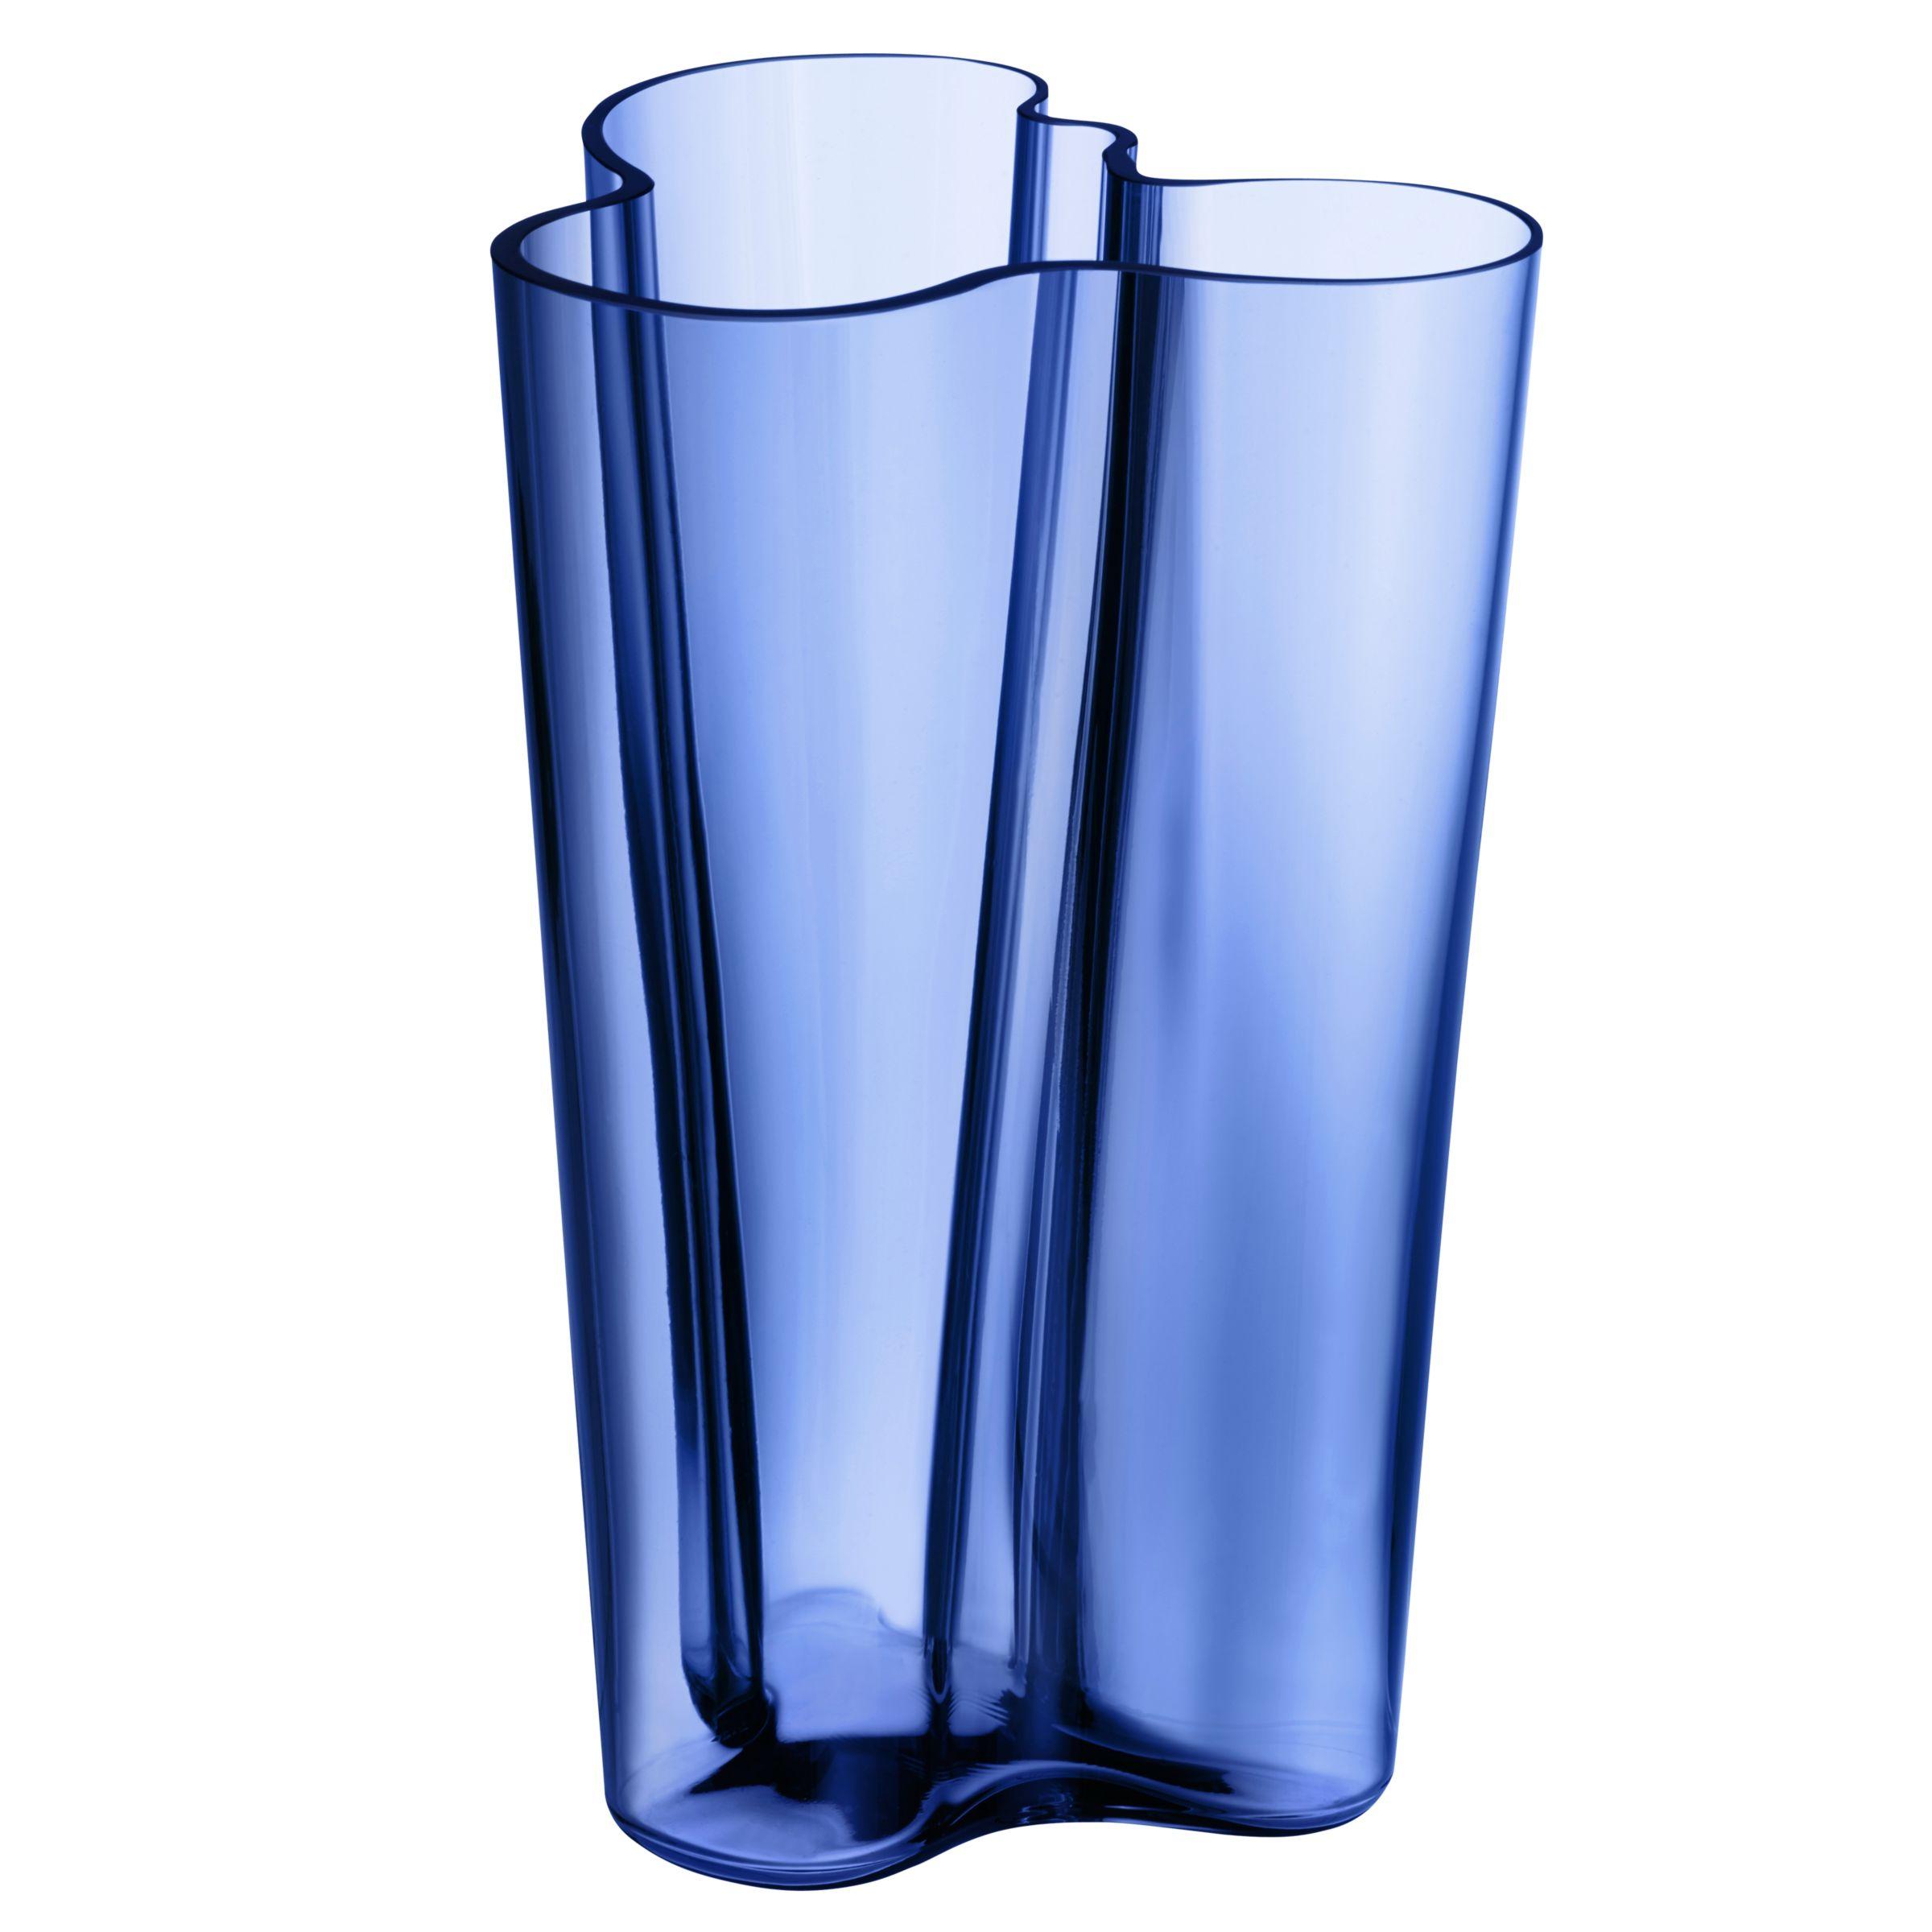 Iittala Iittala Aalto Vase, H25.1cm, Blue